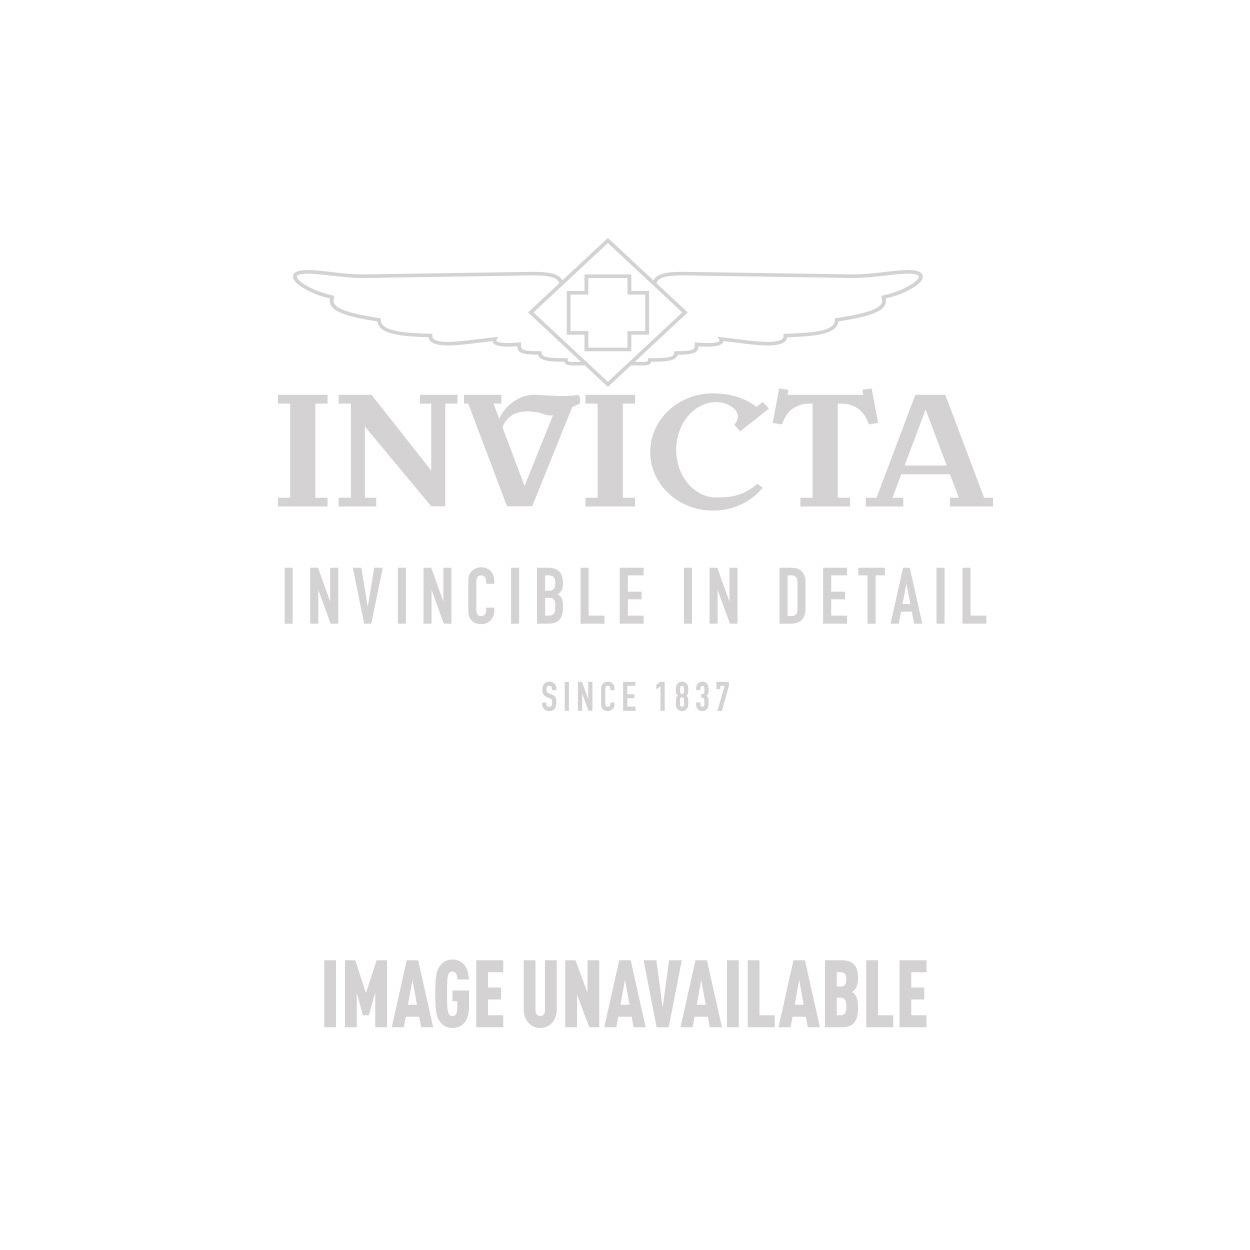 Invicta Bolt Swiss Made Quartz Watch - Titanium, Stainless Steel case with Steel, Titanium, White tone Stainless Steel, Polyurethane band - Model 19769